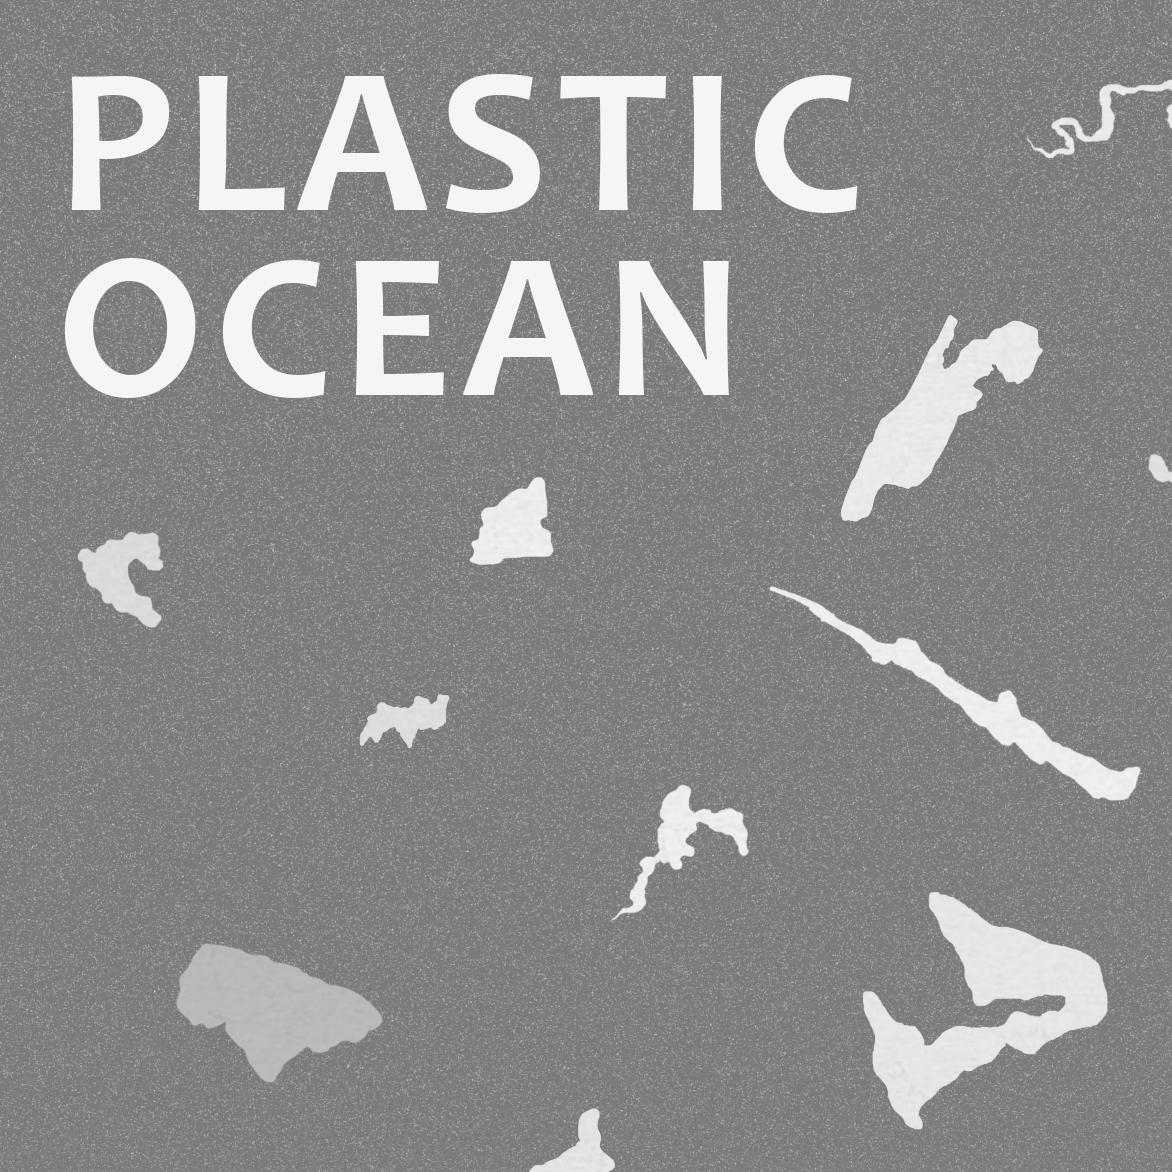 http://www.calibrofestival.com/wp-content/uploads/2019/03/plastic_ocean_sito_bw.jpg